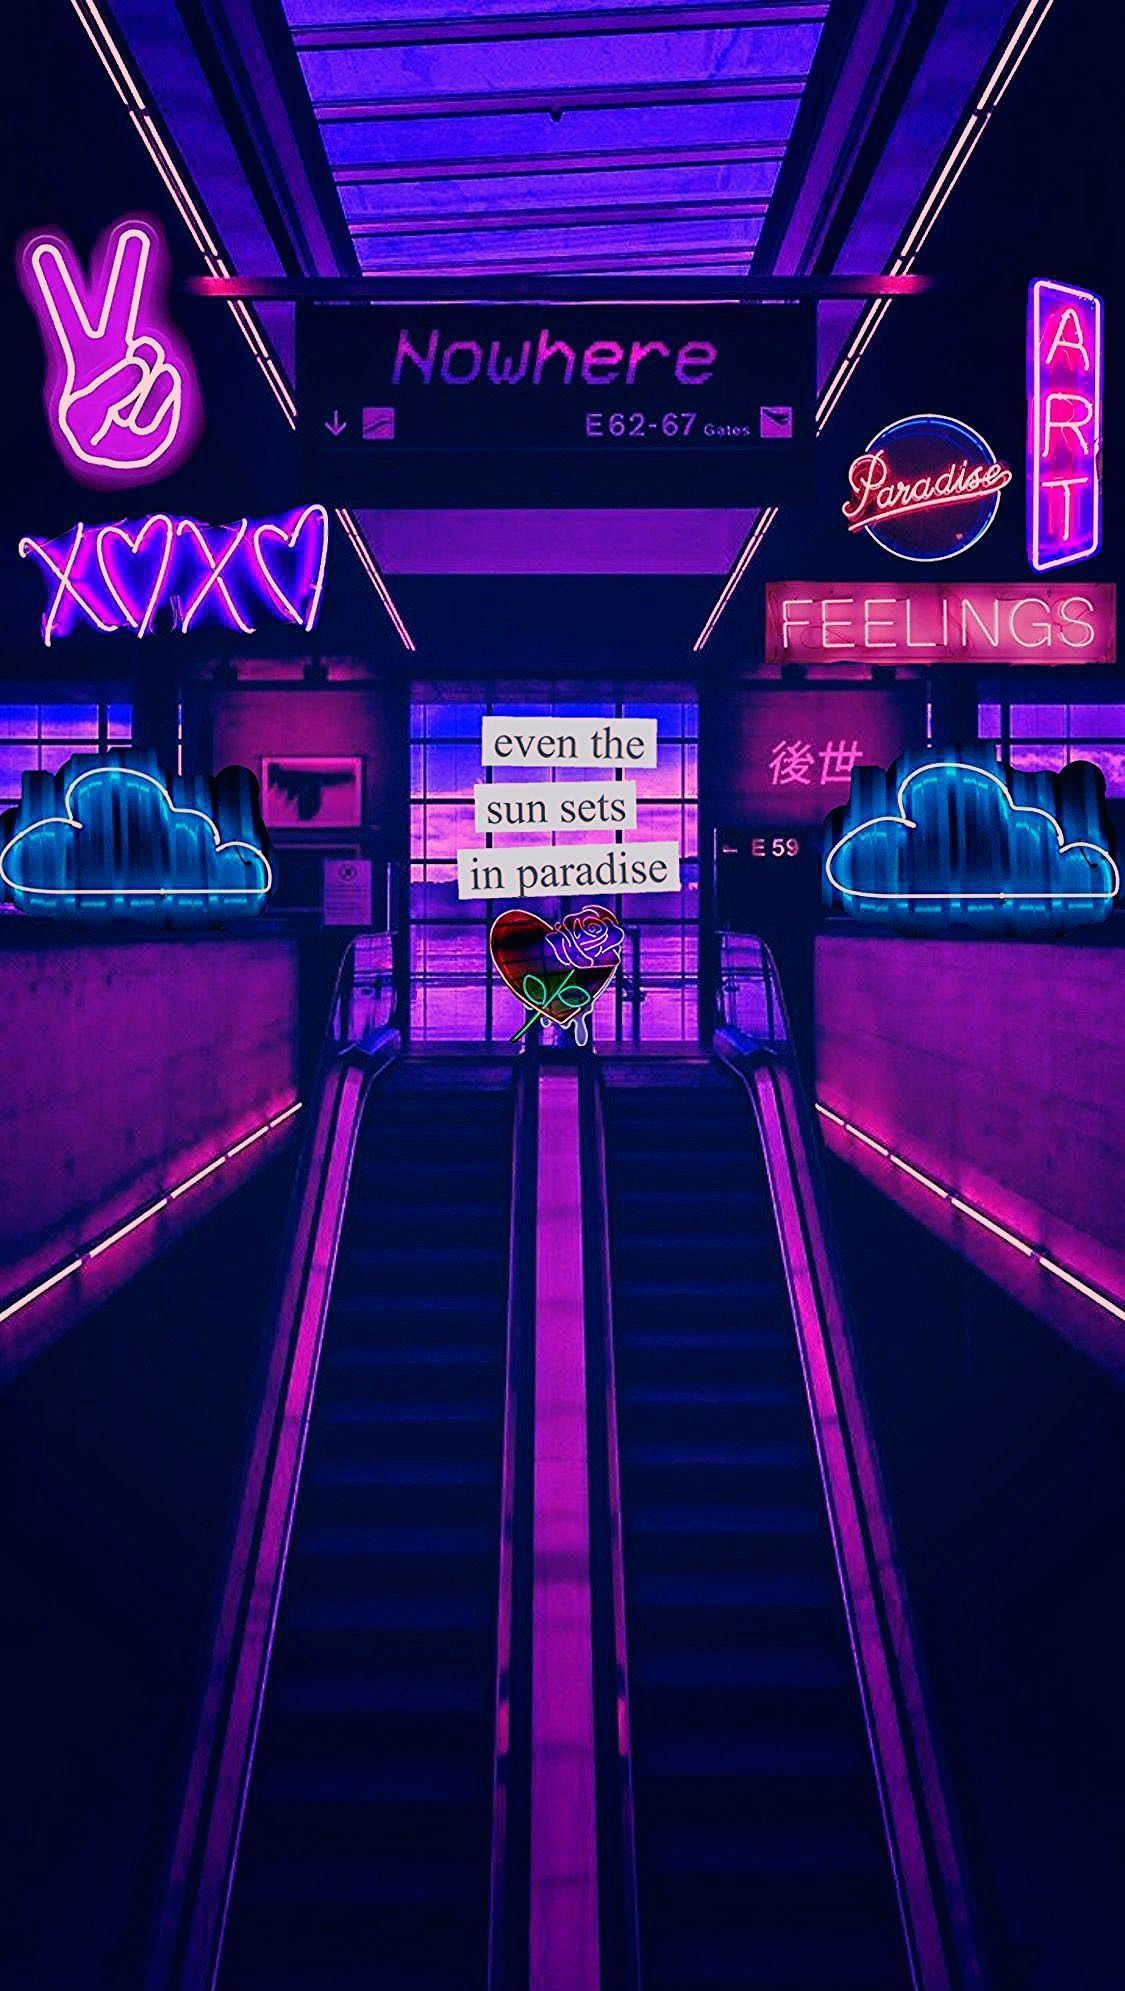 Quotes Wallpaper Iphone Neon Purple Aesthetic Wallpaper Neon Purple Iphone Wallpapers Top Free Neon Purple Iphone Backgrounds Wallpaperaccess neon purple iphone wallpapers top